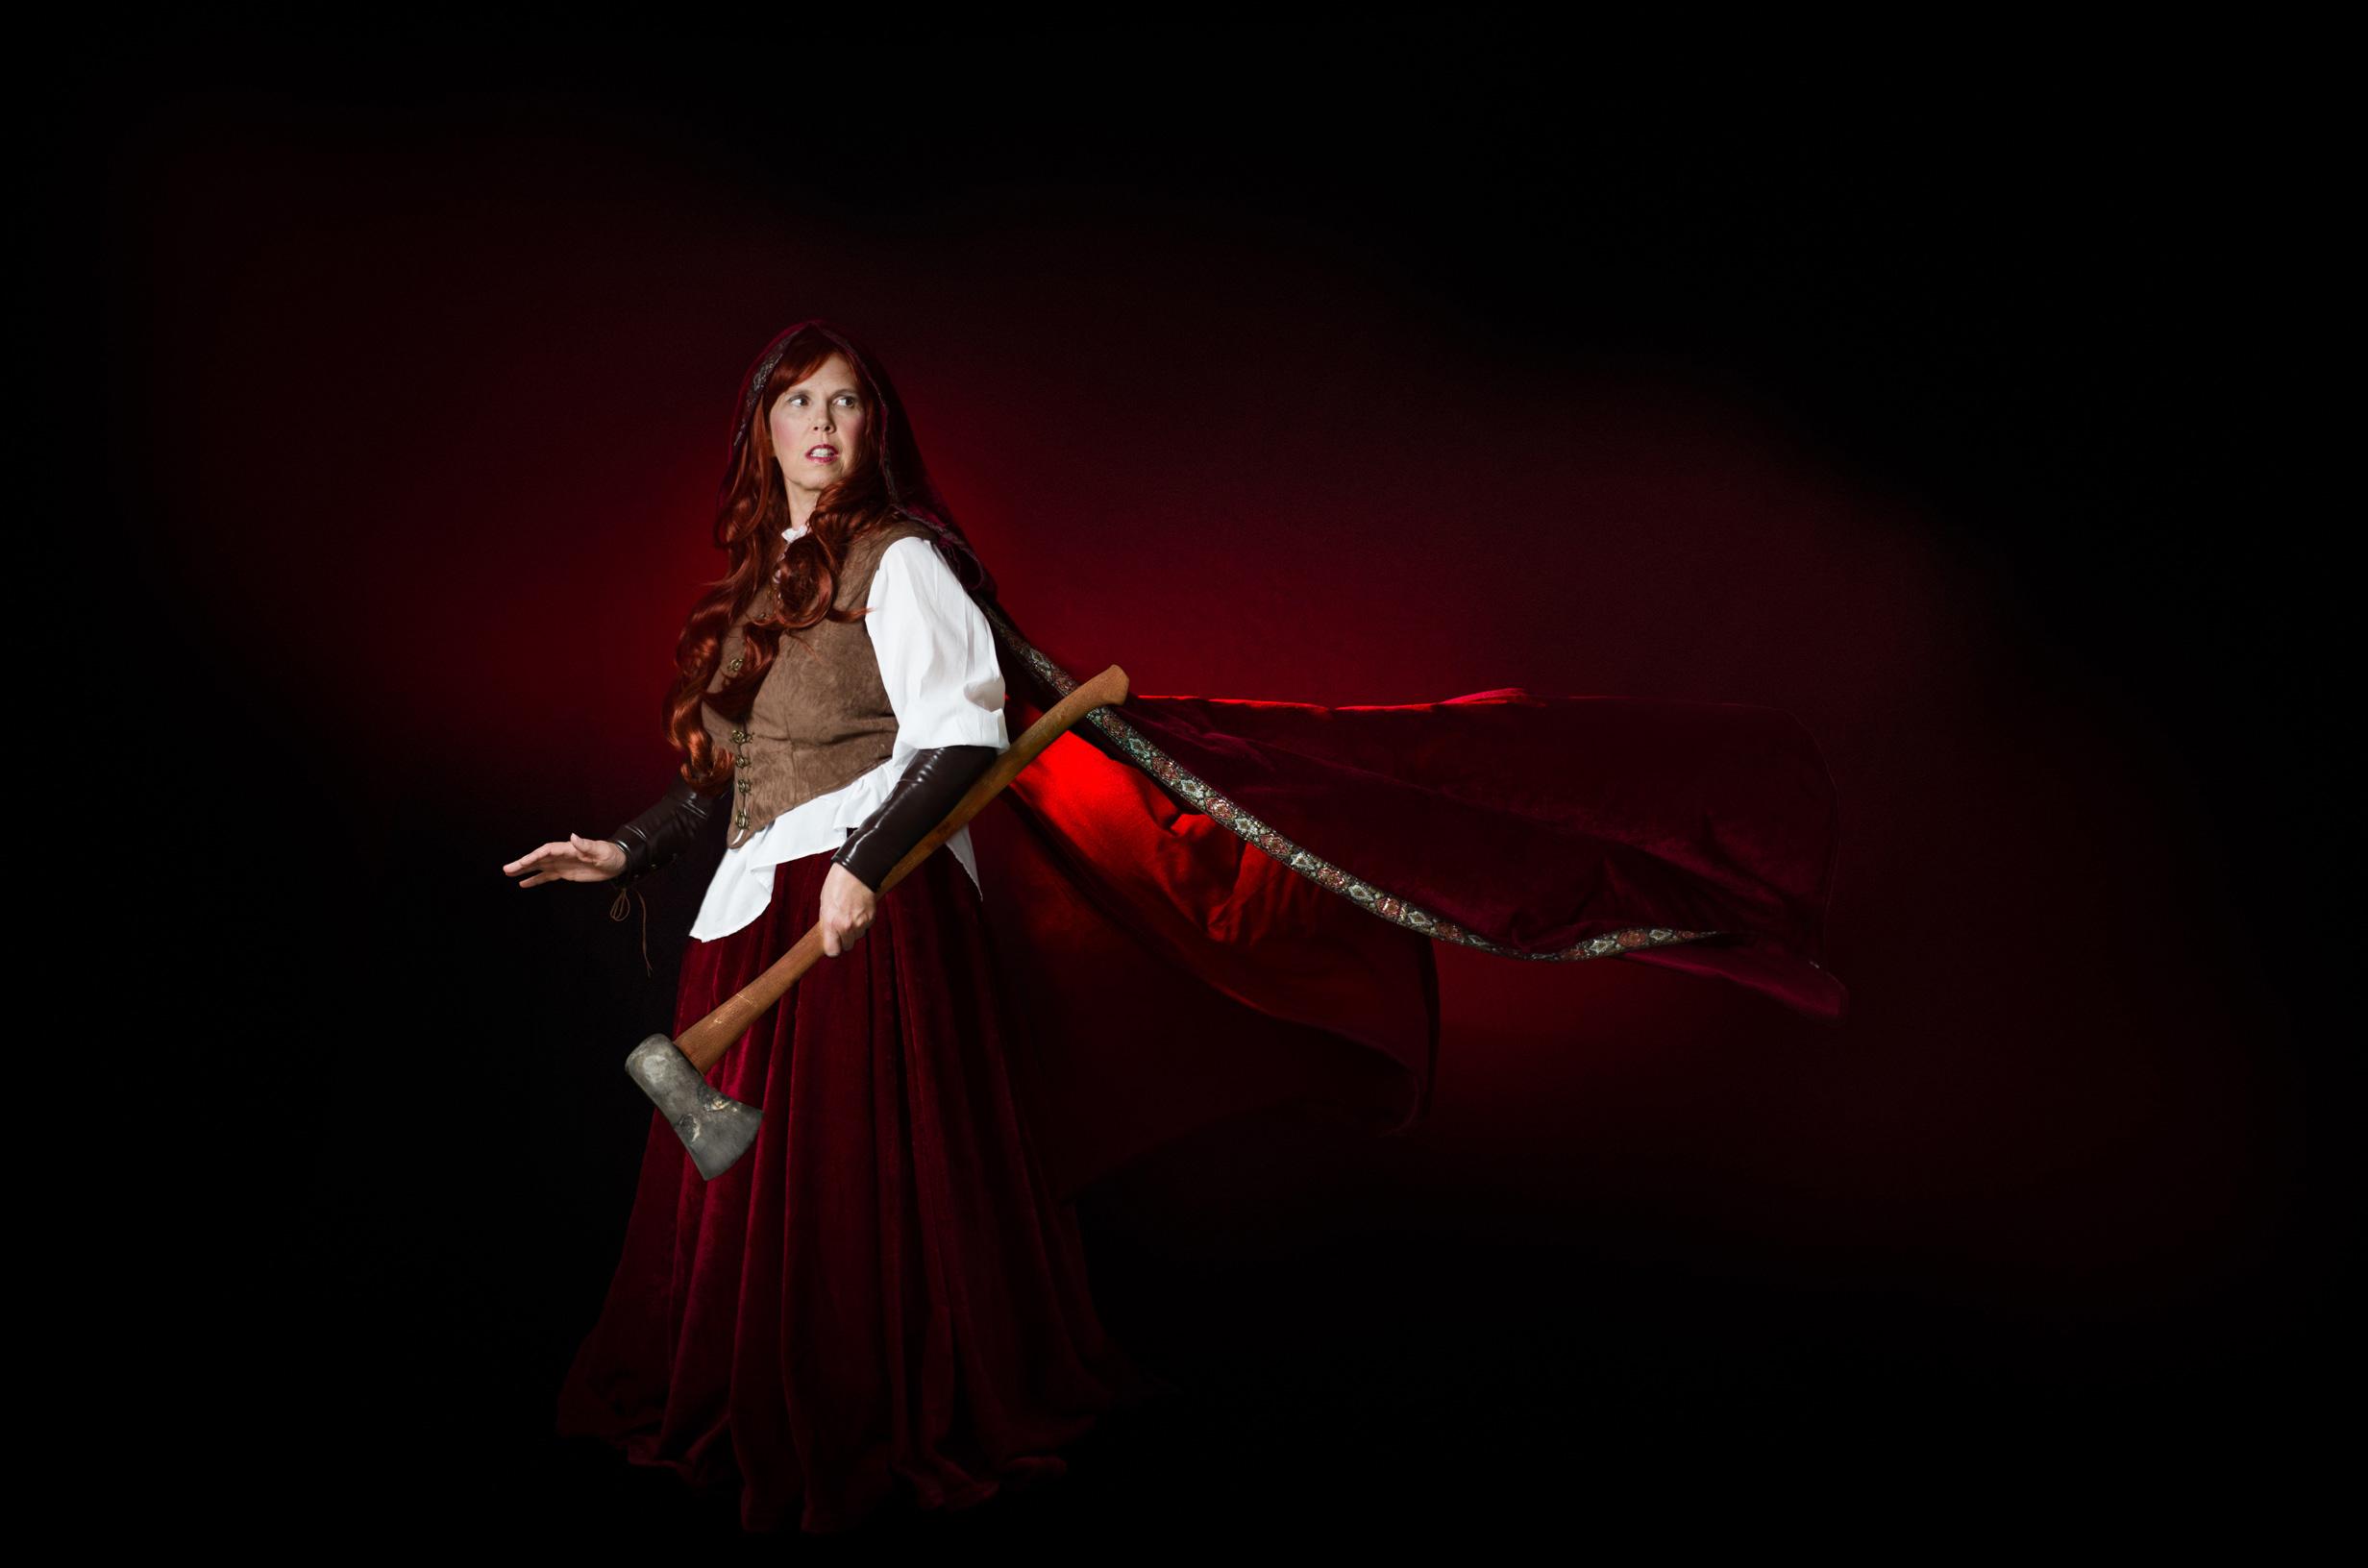 Red Riding Hood - Halloween Portrait 2017